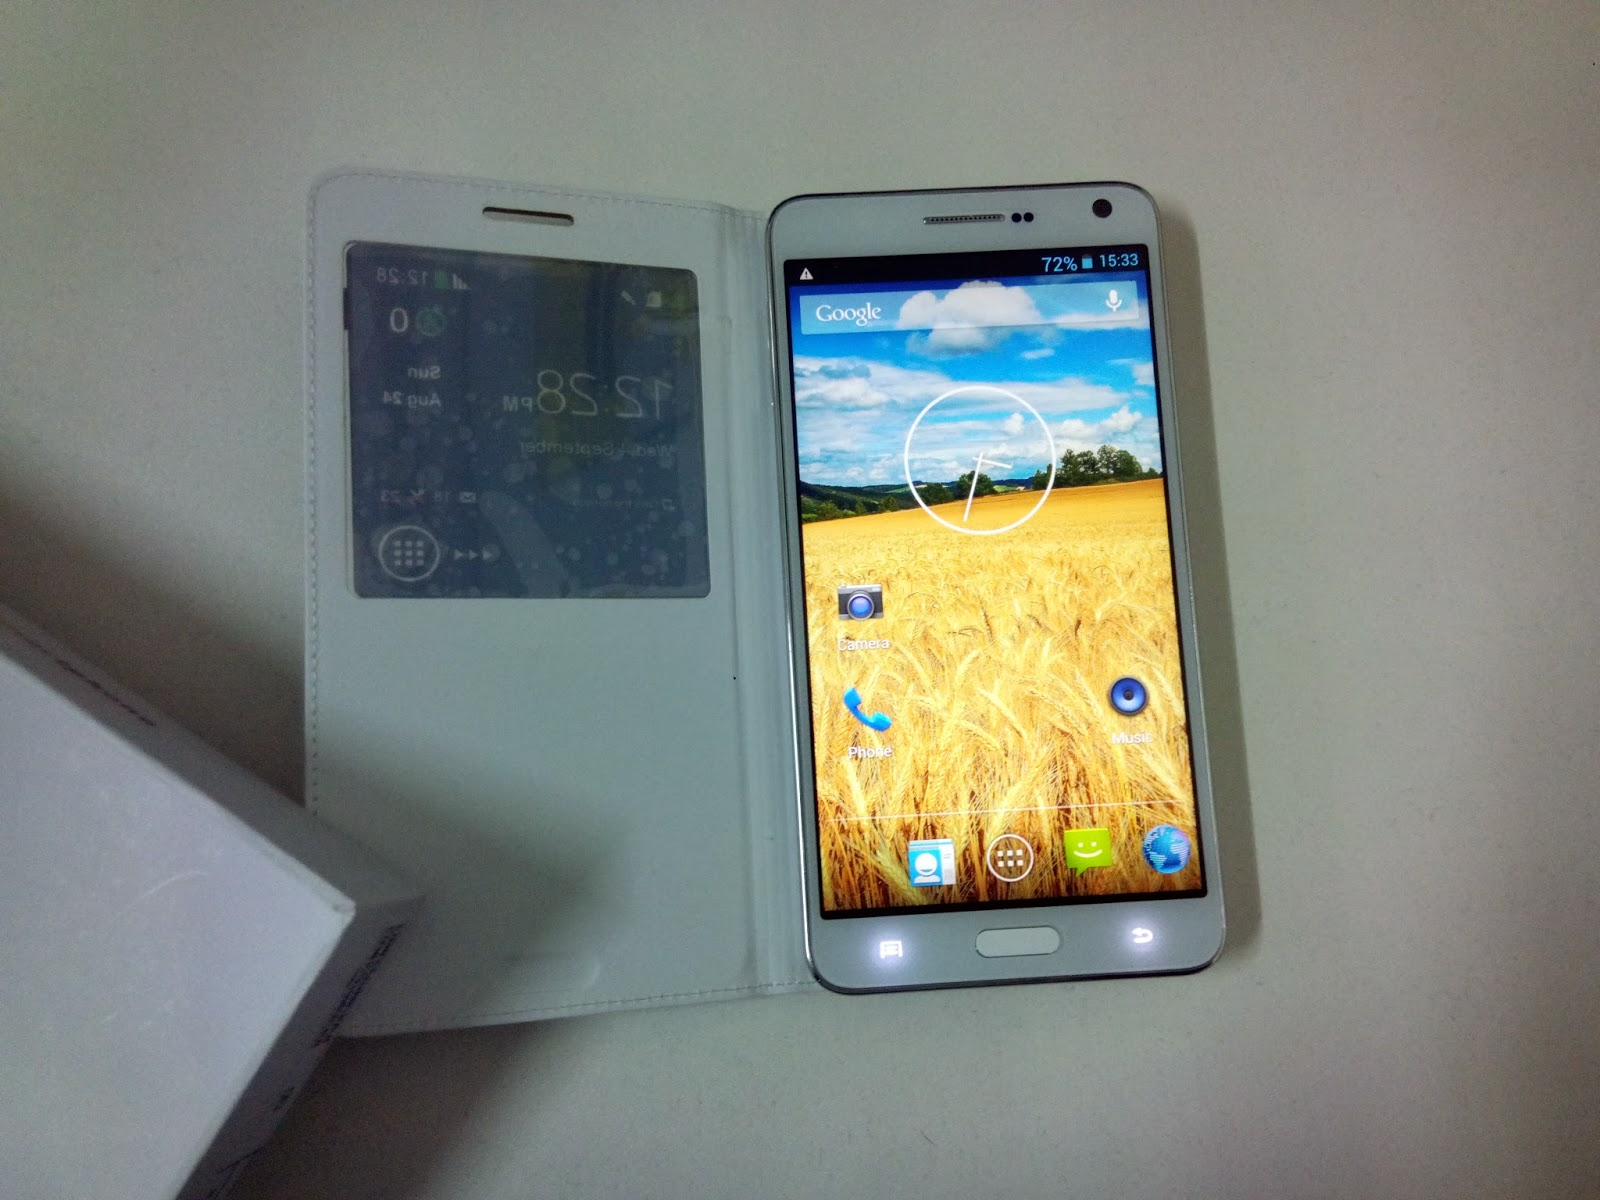 derniers android t l phone et tablette pc avis meilleure samsung galaxy s5 clone goophone s5. Black Bedroom Furniture Sets. Home Design Ideas